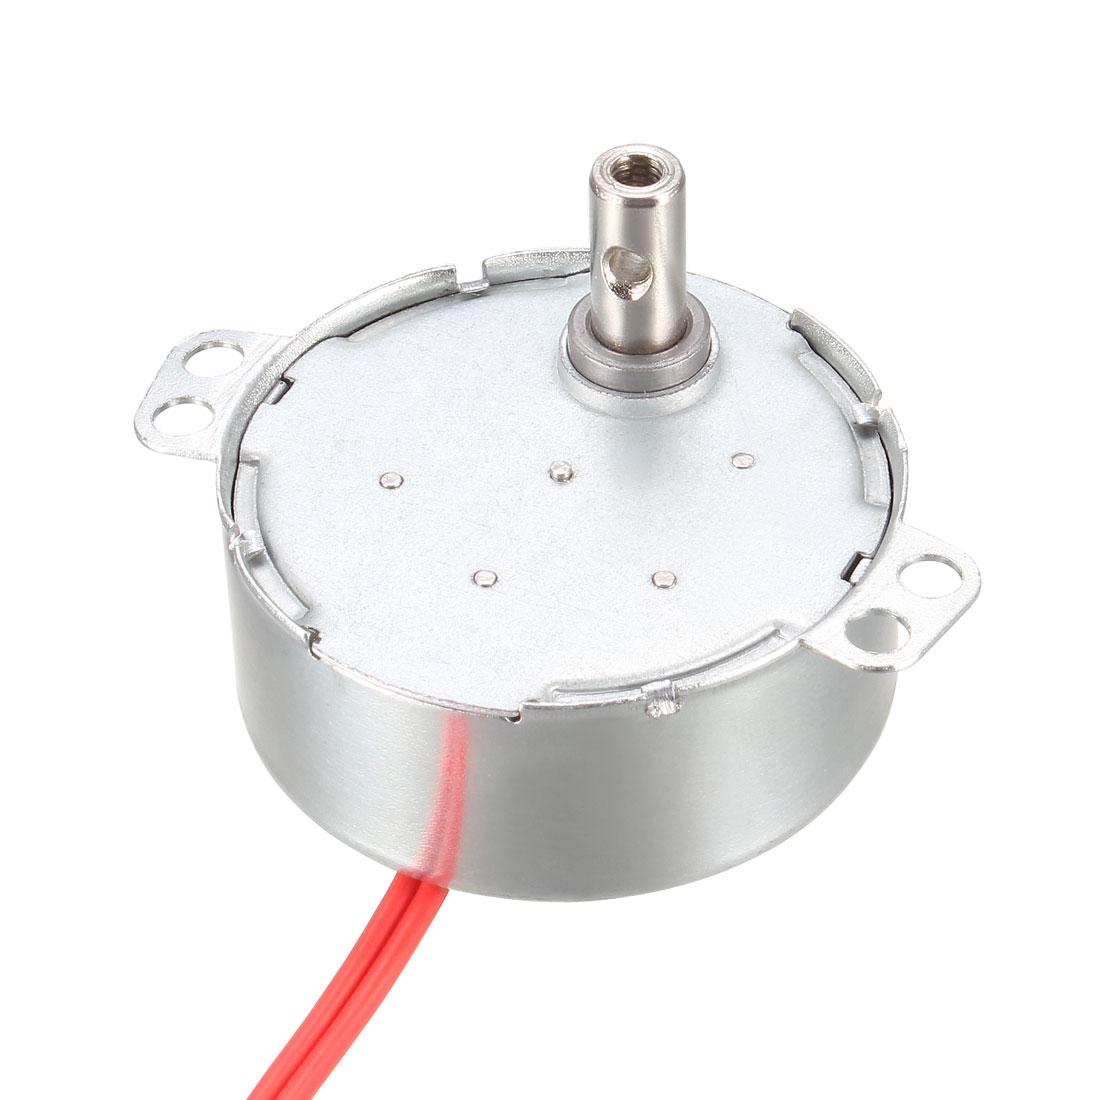 Synchronous Synchron Motor - Turntable Motor AC 12V 50-60Hz CCW/CW 4W 5-6RPM